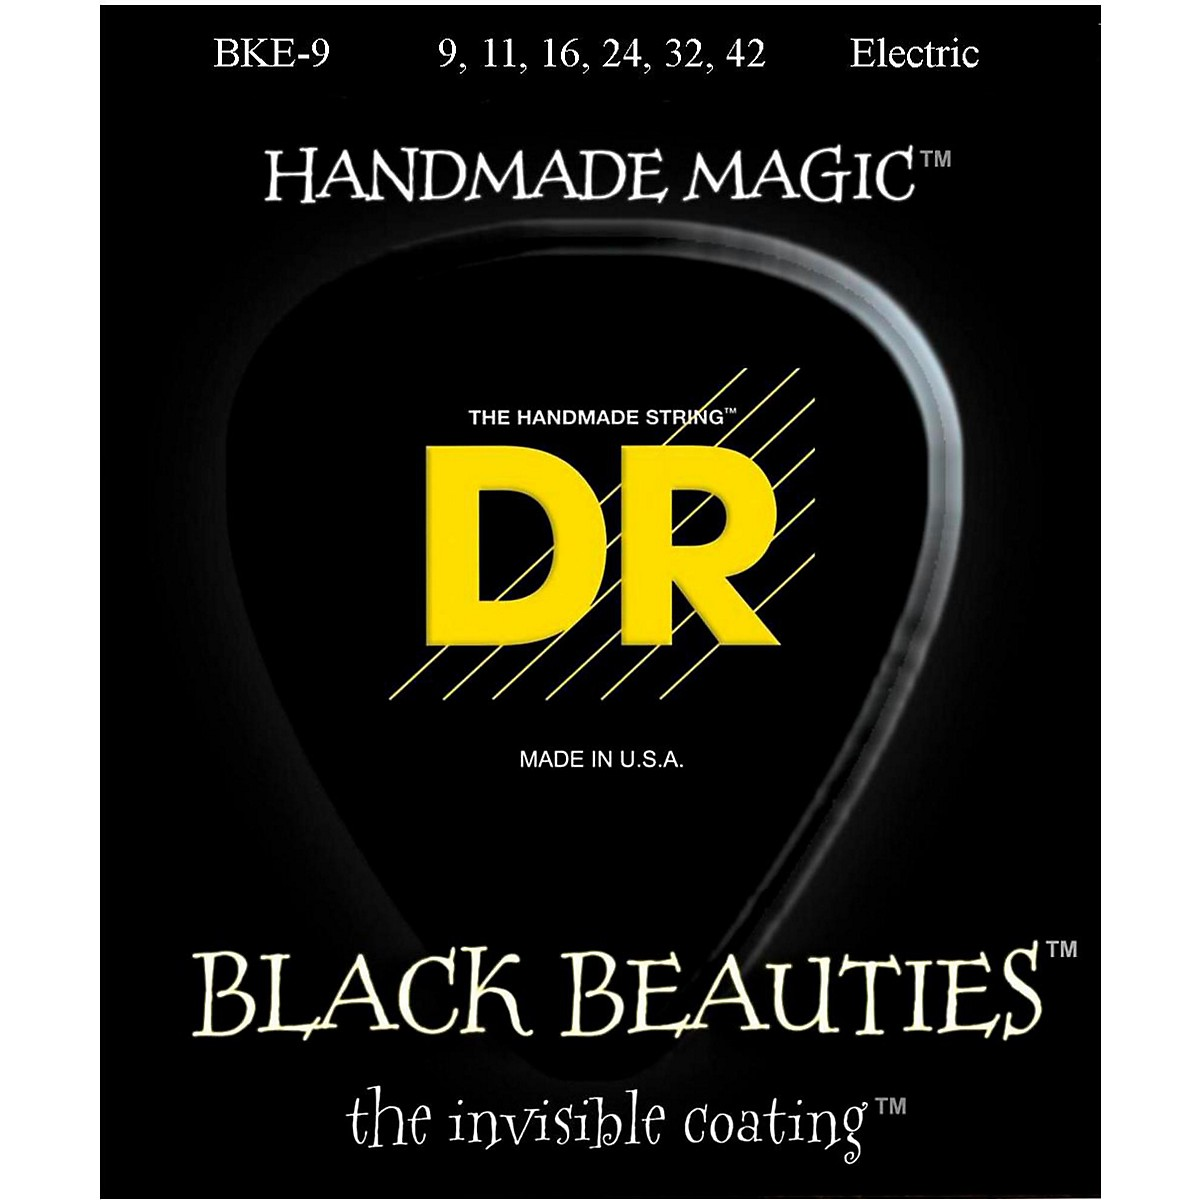 DR Strings Extra Life BKE-9 Black Beauties Lite Coated Electric Guitar Strings